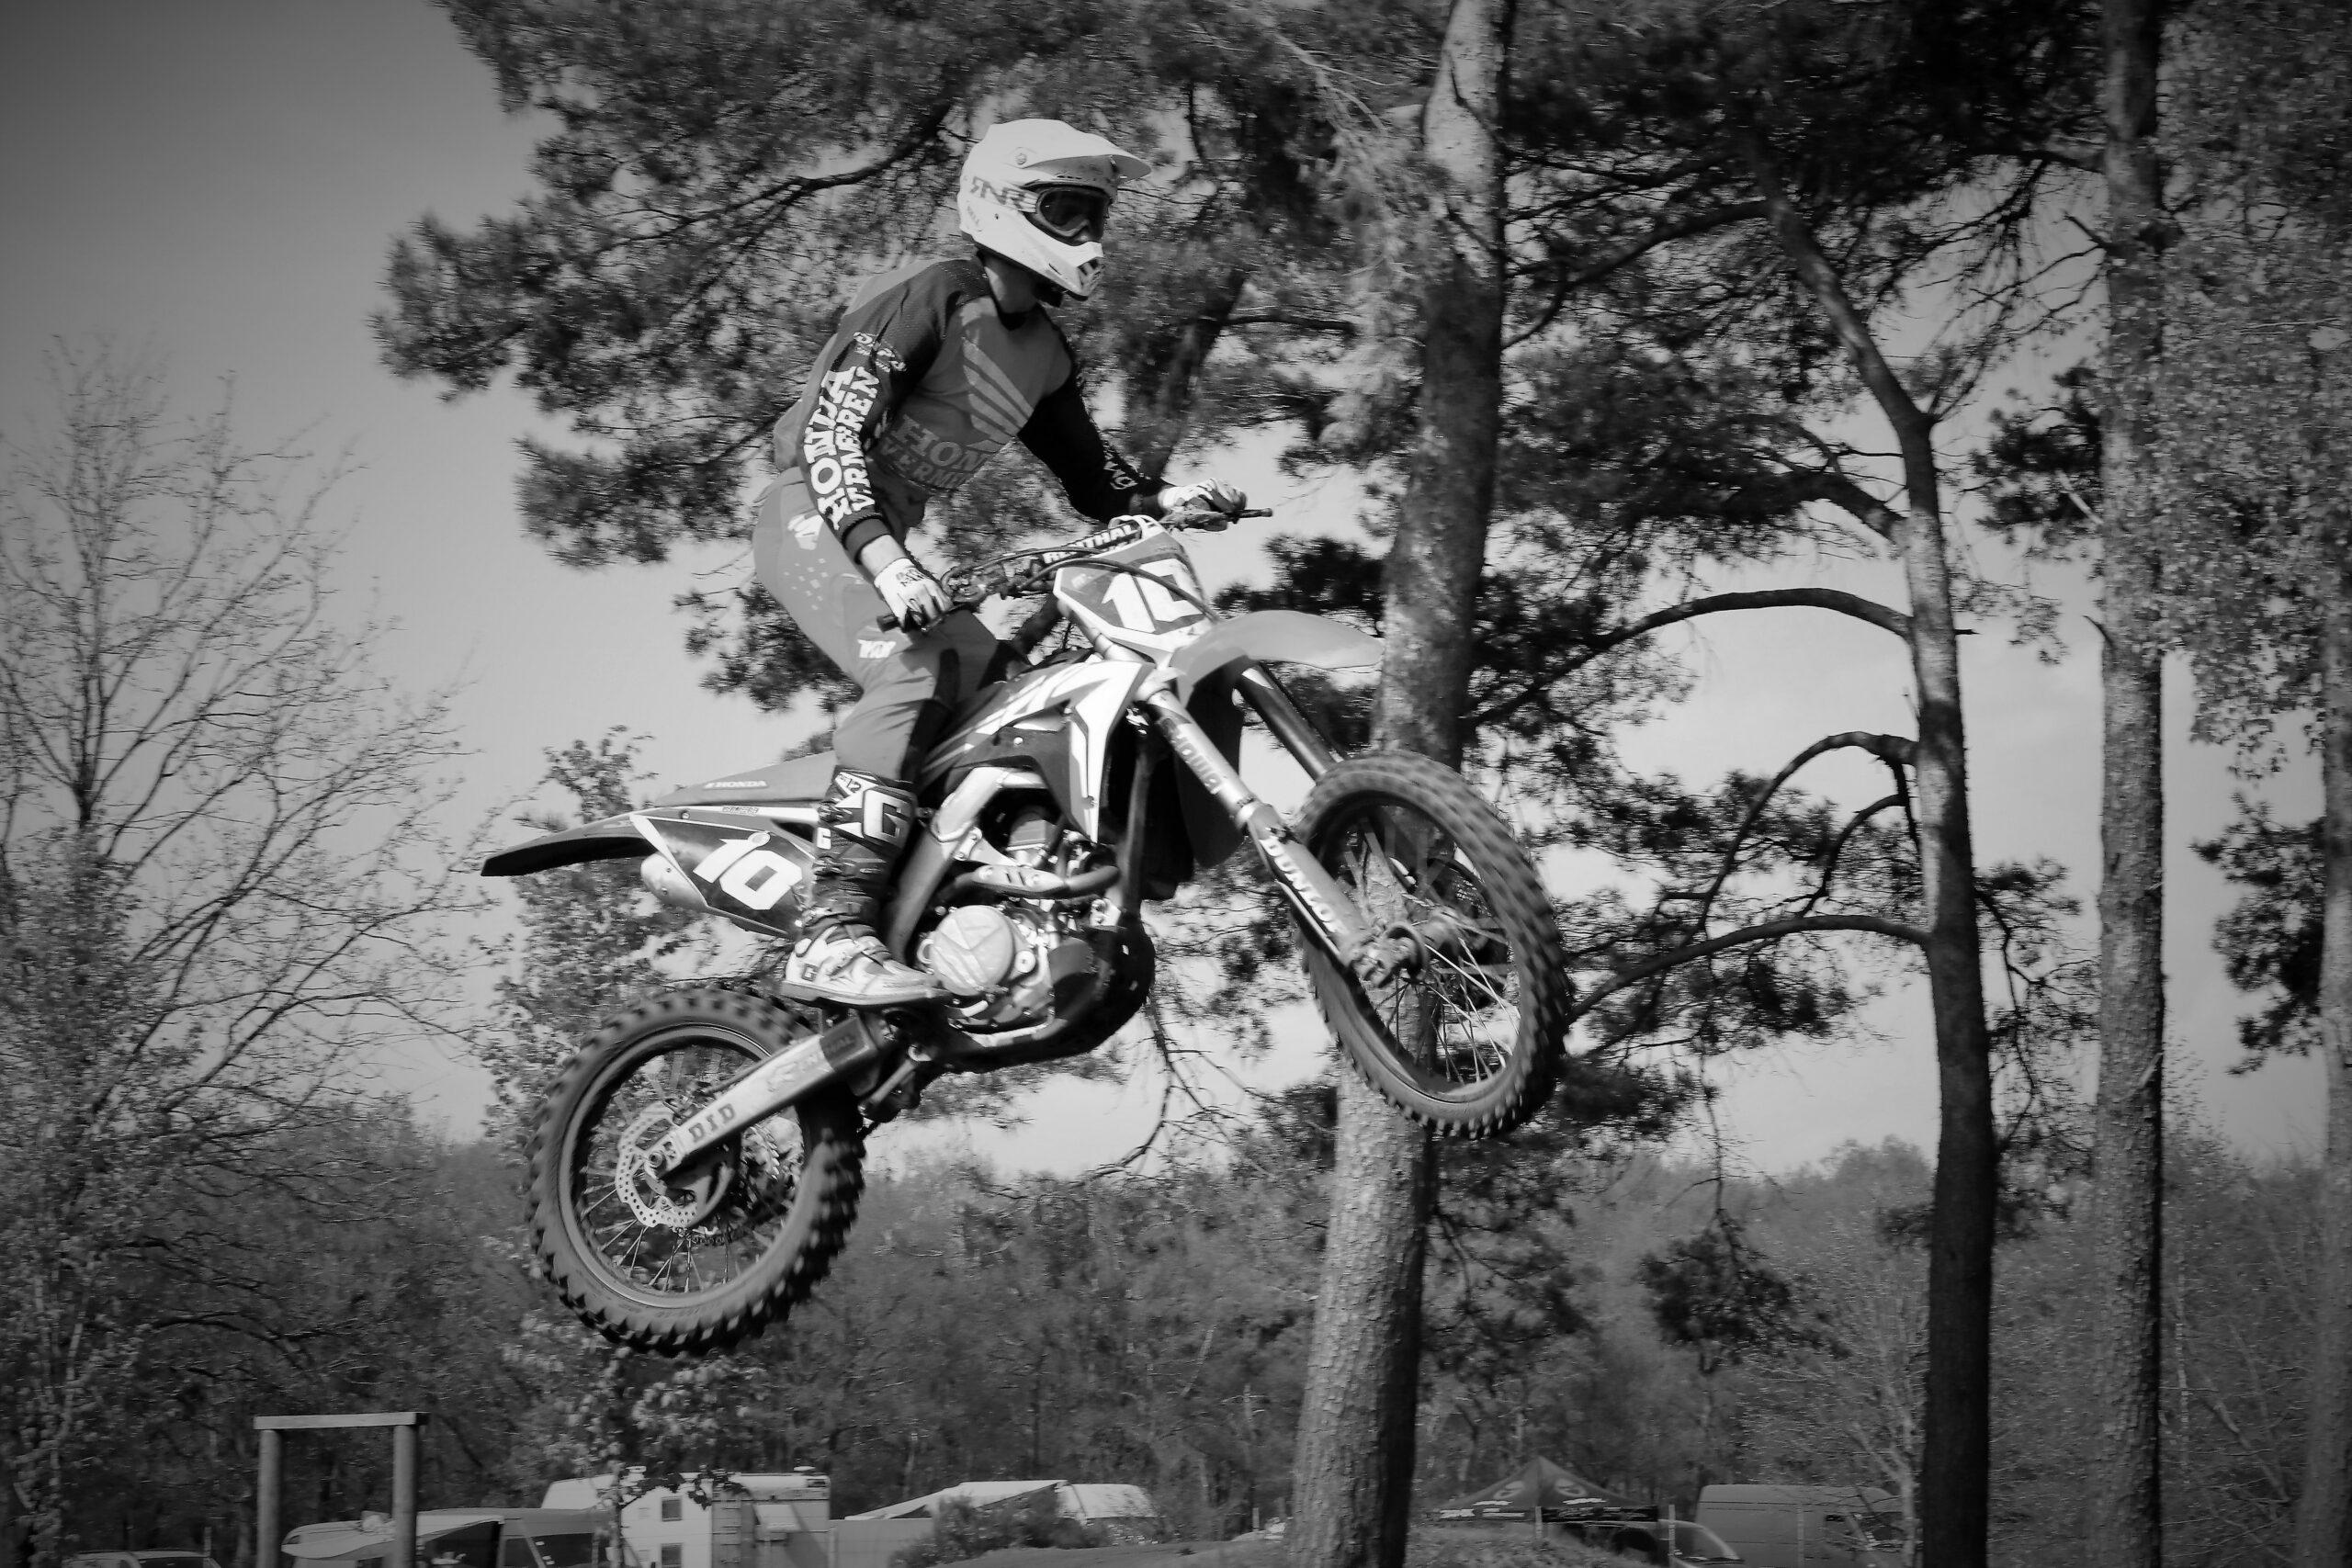 crosser jump